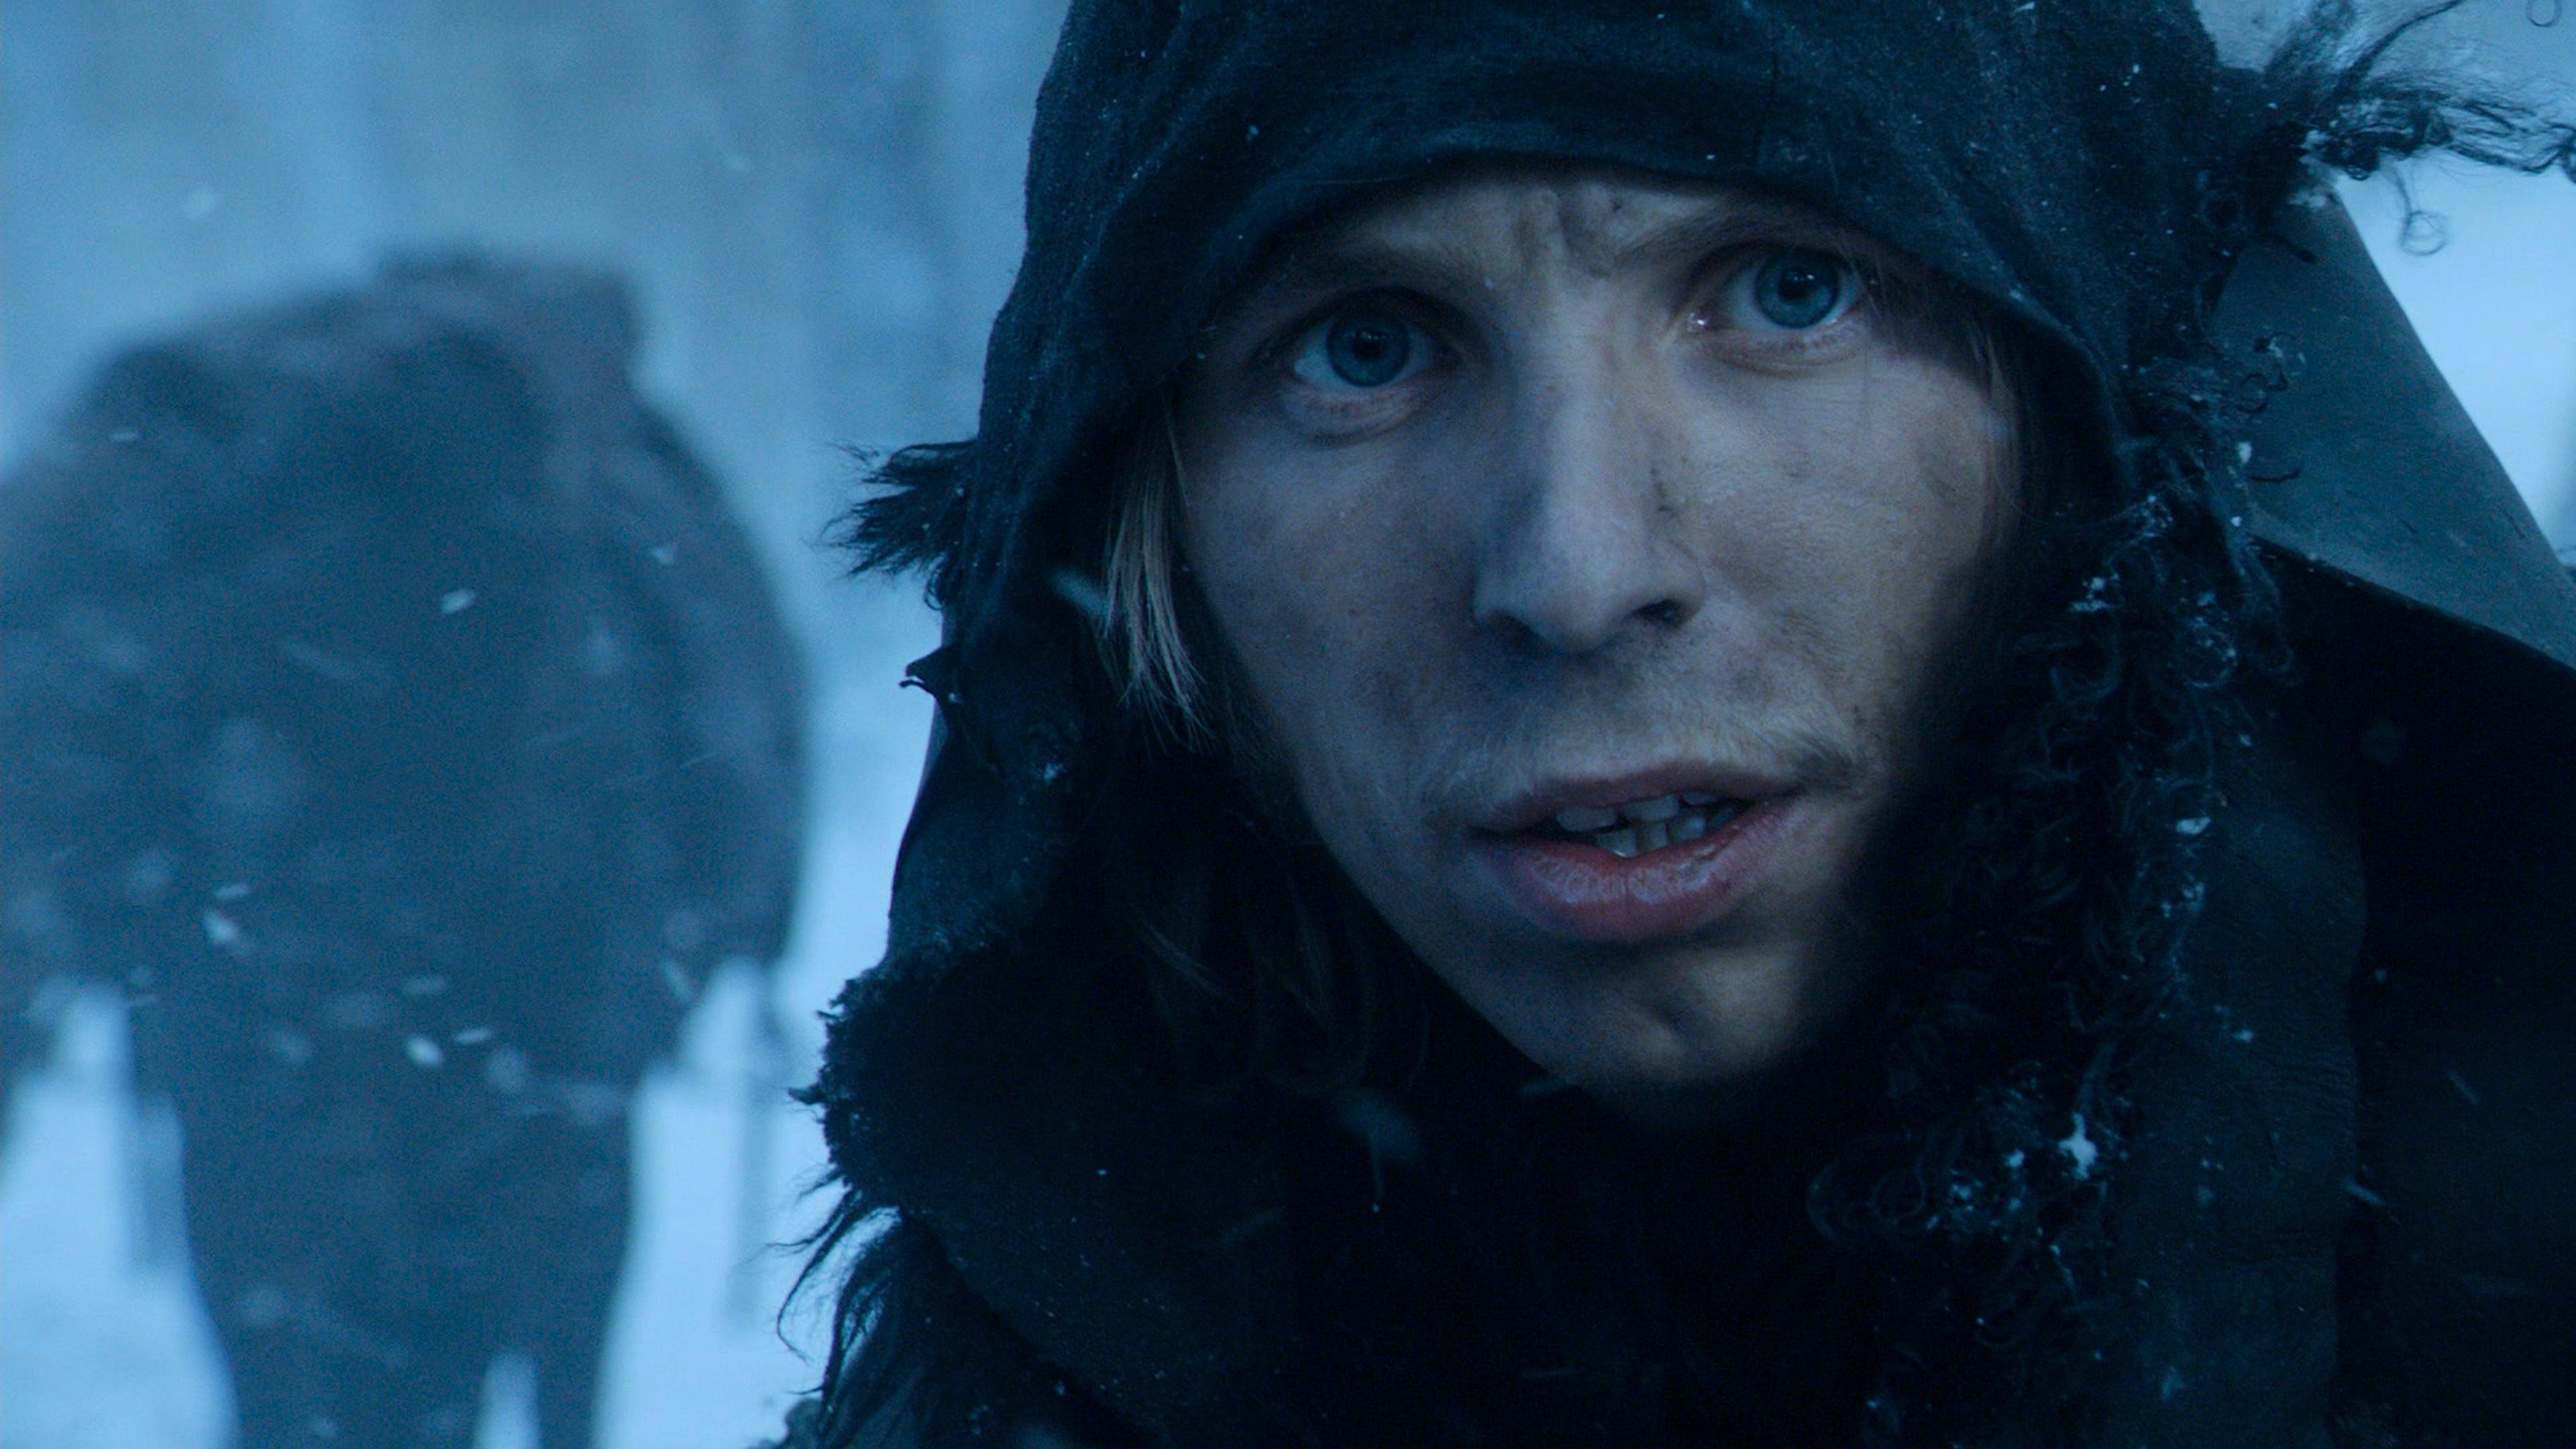 voir Game of Thrones saison 1 episode 1 en streaming cinema - VFstream